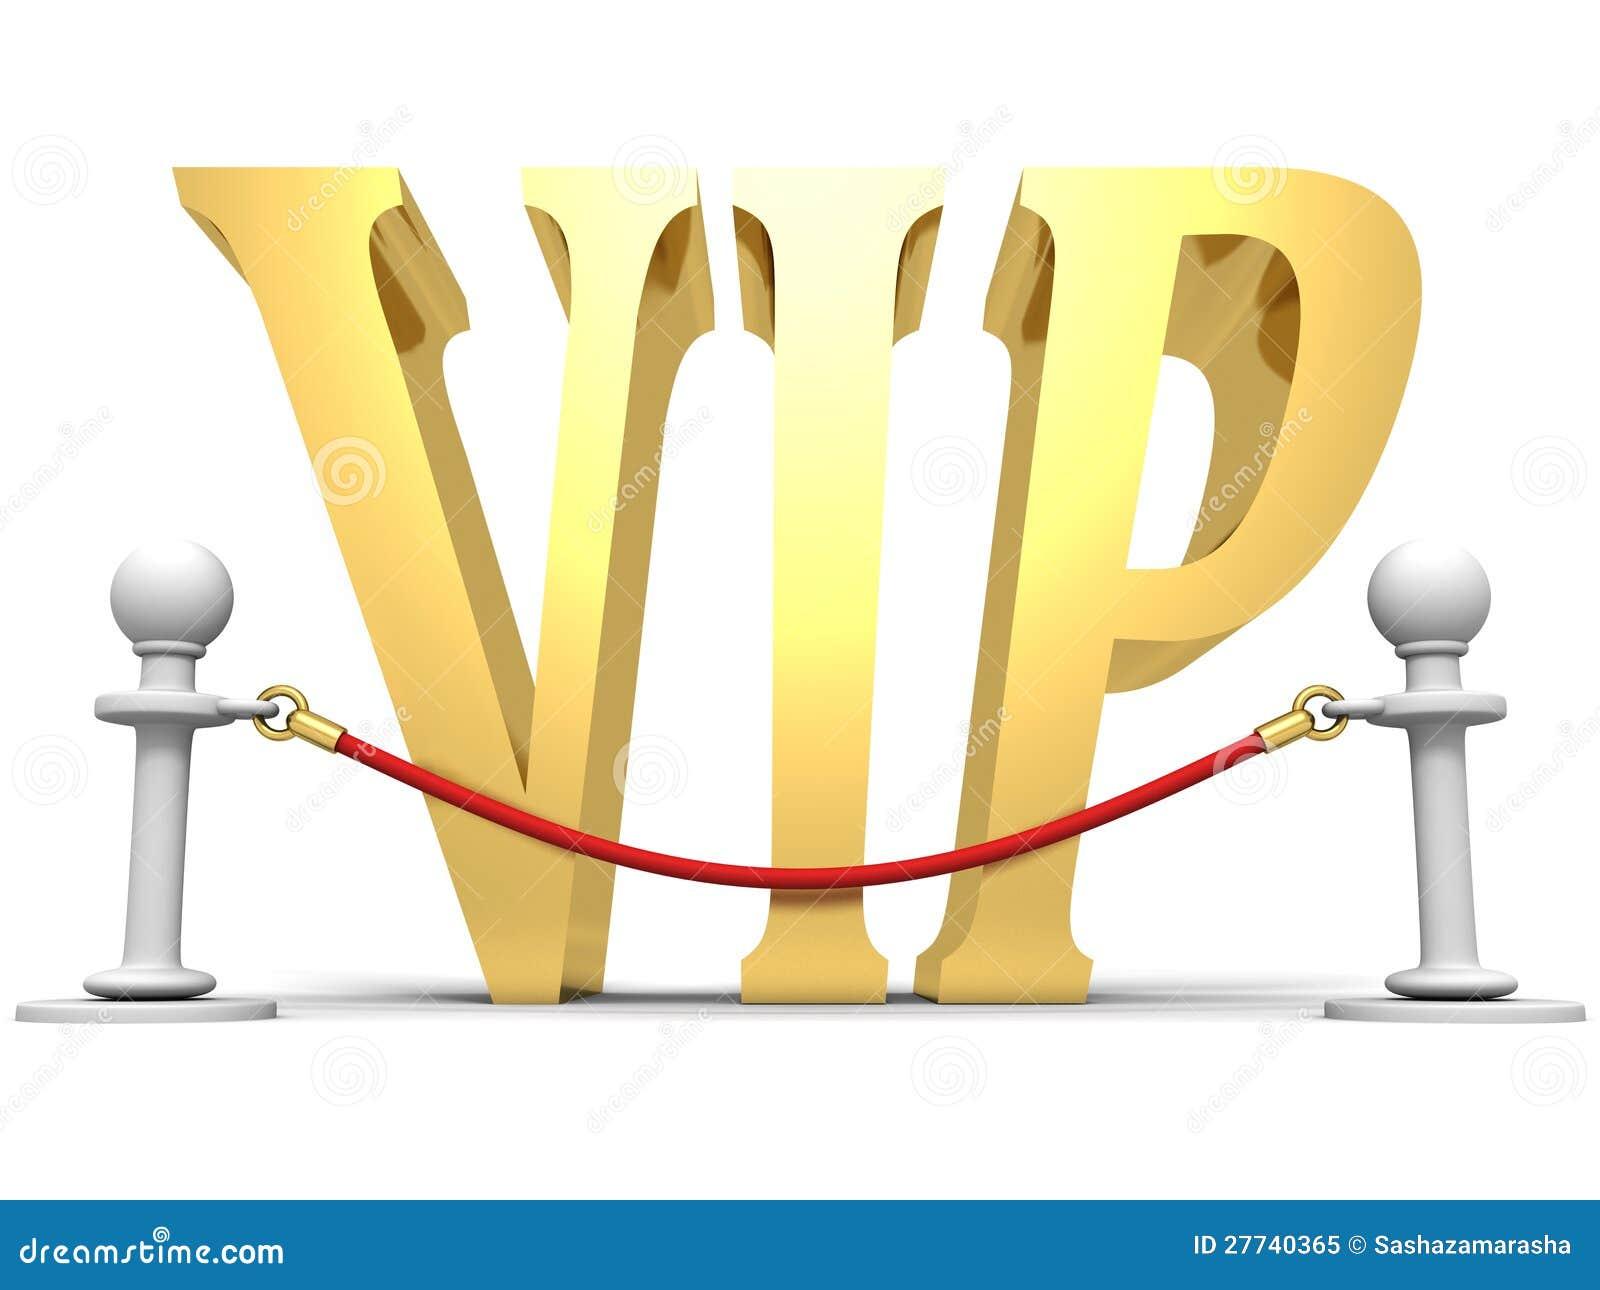 golden vip sign behind velvet rope barrier royalty free dollar sign clip art border dollar sign clipart in black